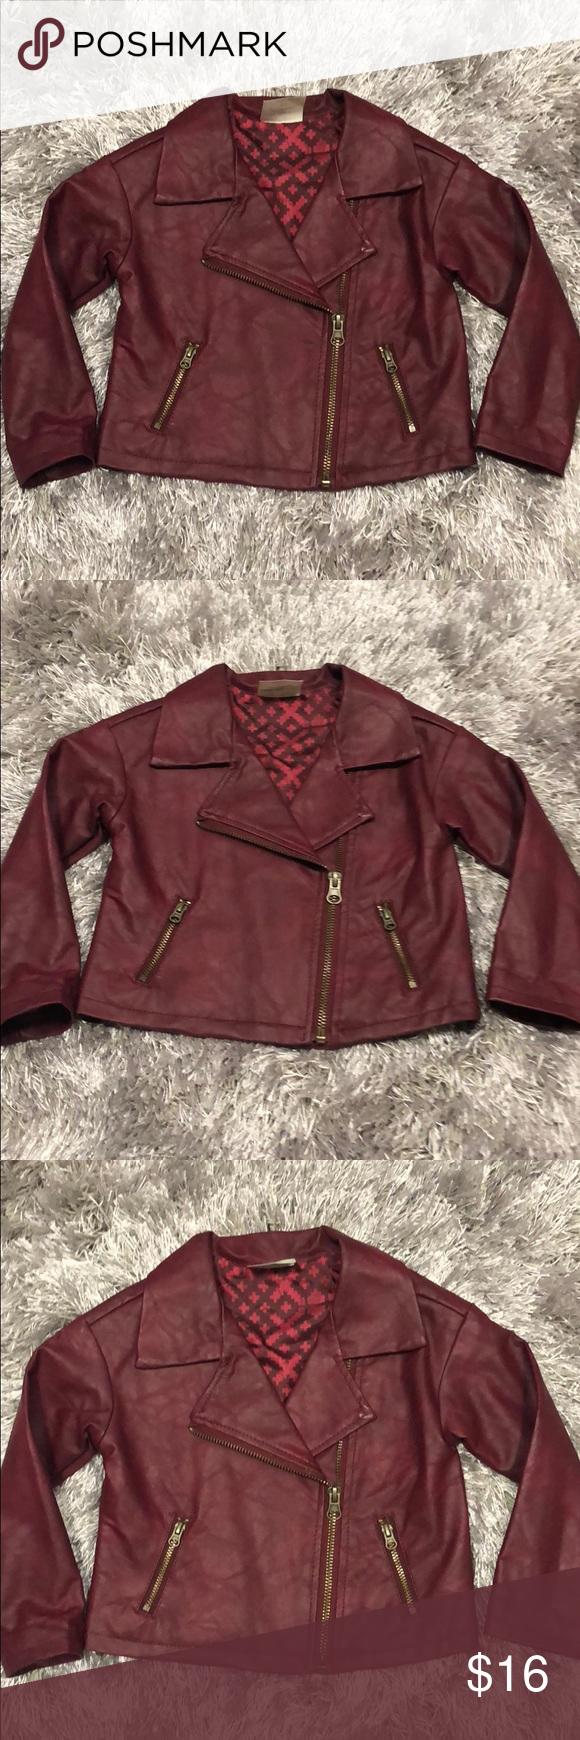 Toddler Burgundy Faux Leather Jacket Burgundy Faux Leather Jacket Leather Jacket Brands Clothes Design [ 1740 x 580 Pixel ]